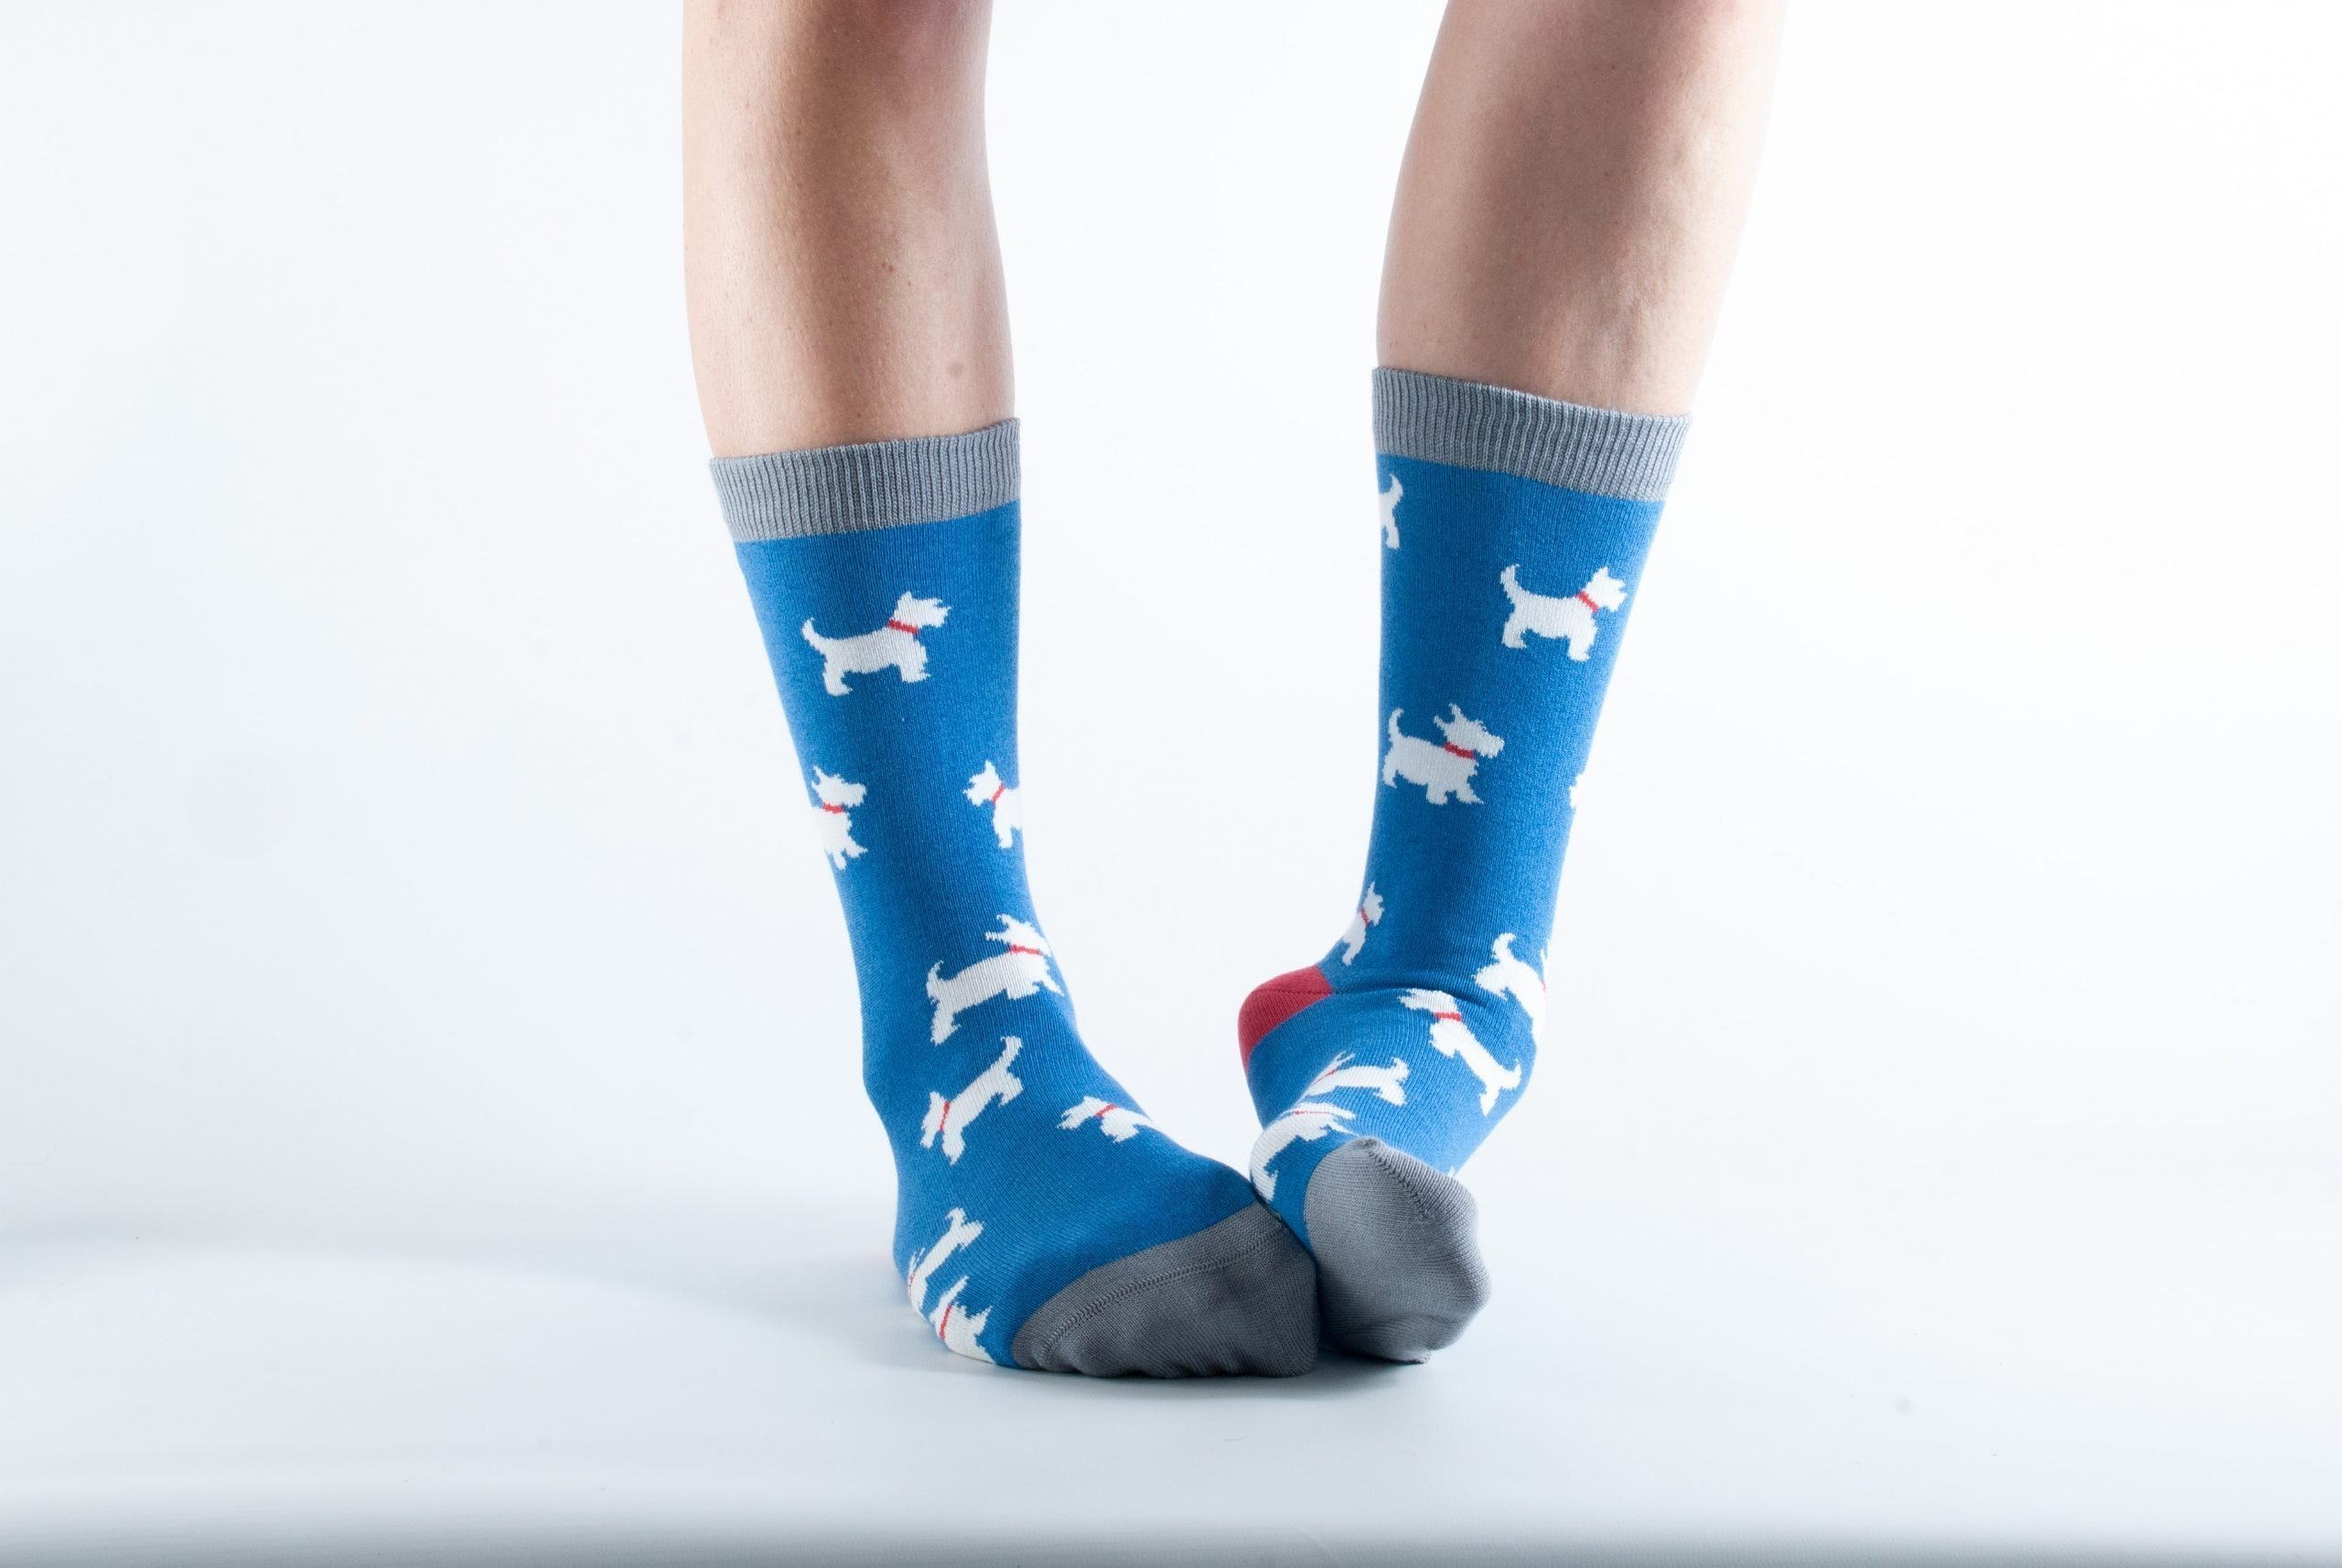 Womens Scottie dog bamboo socks - blue and grey